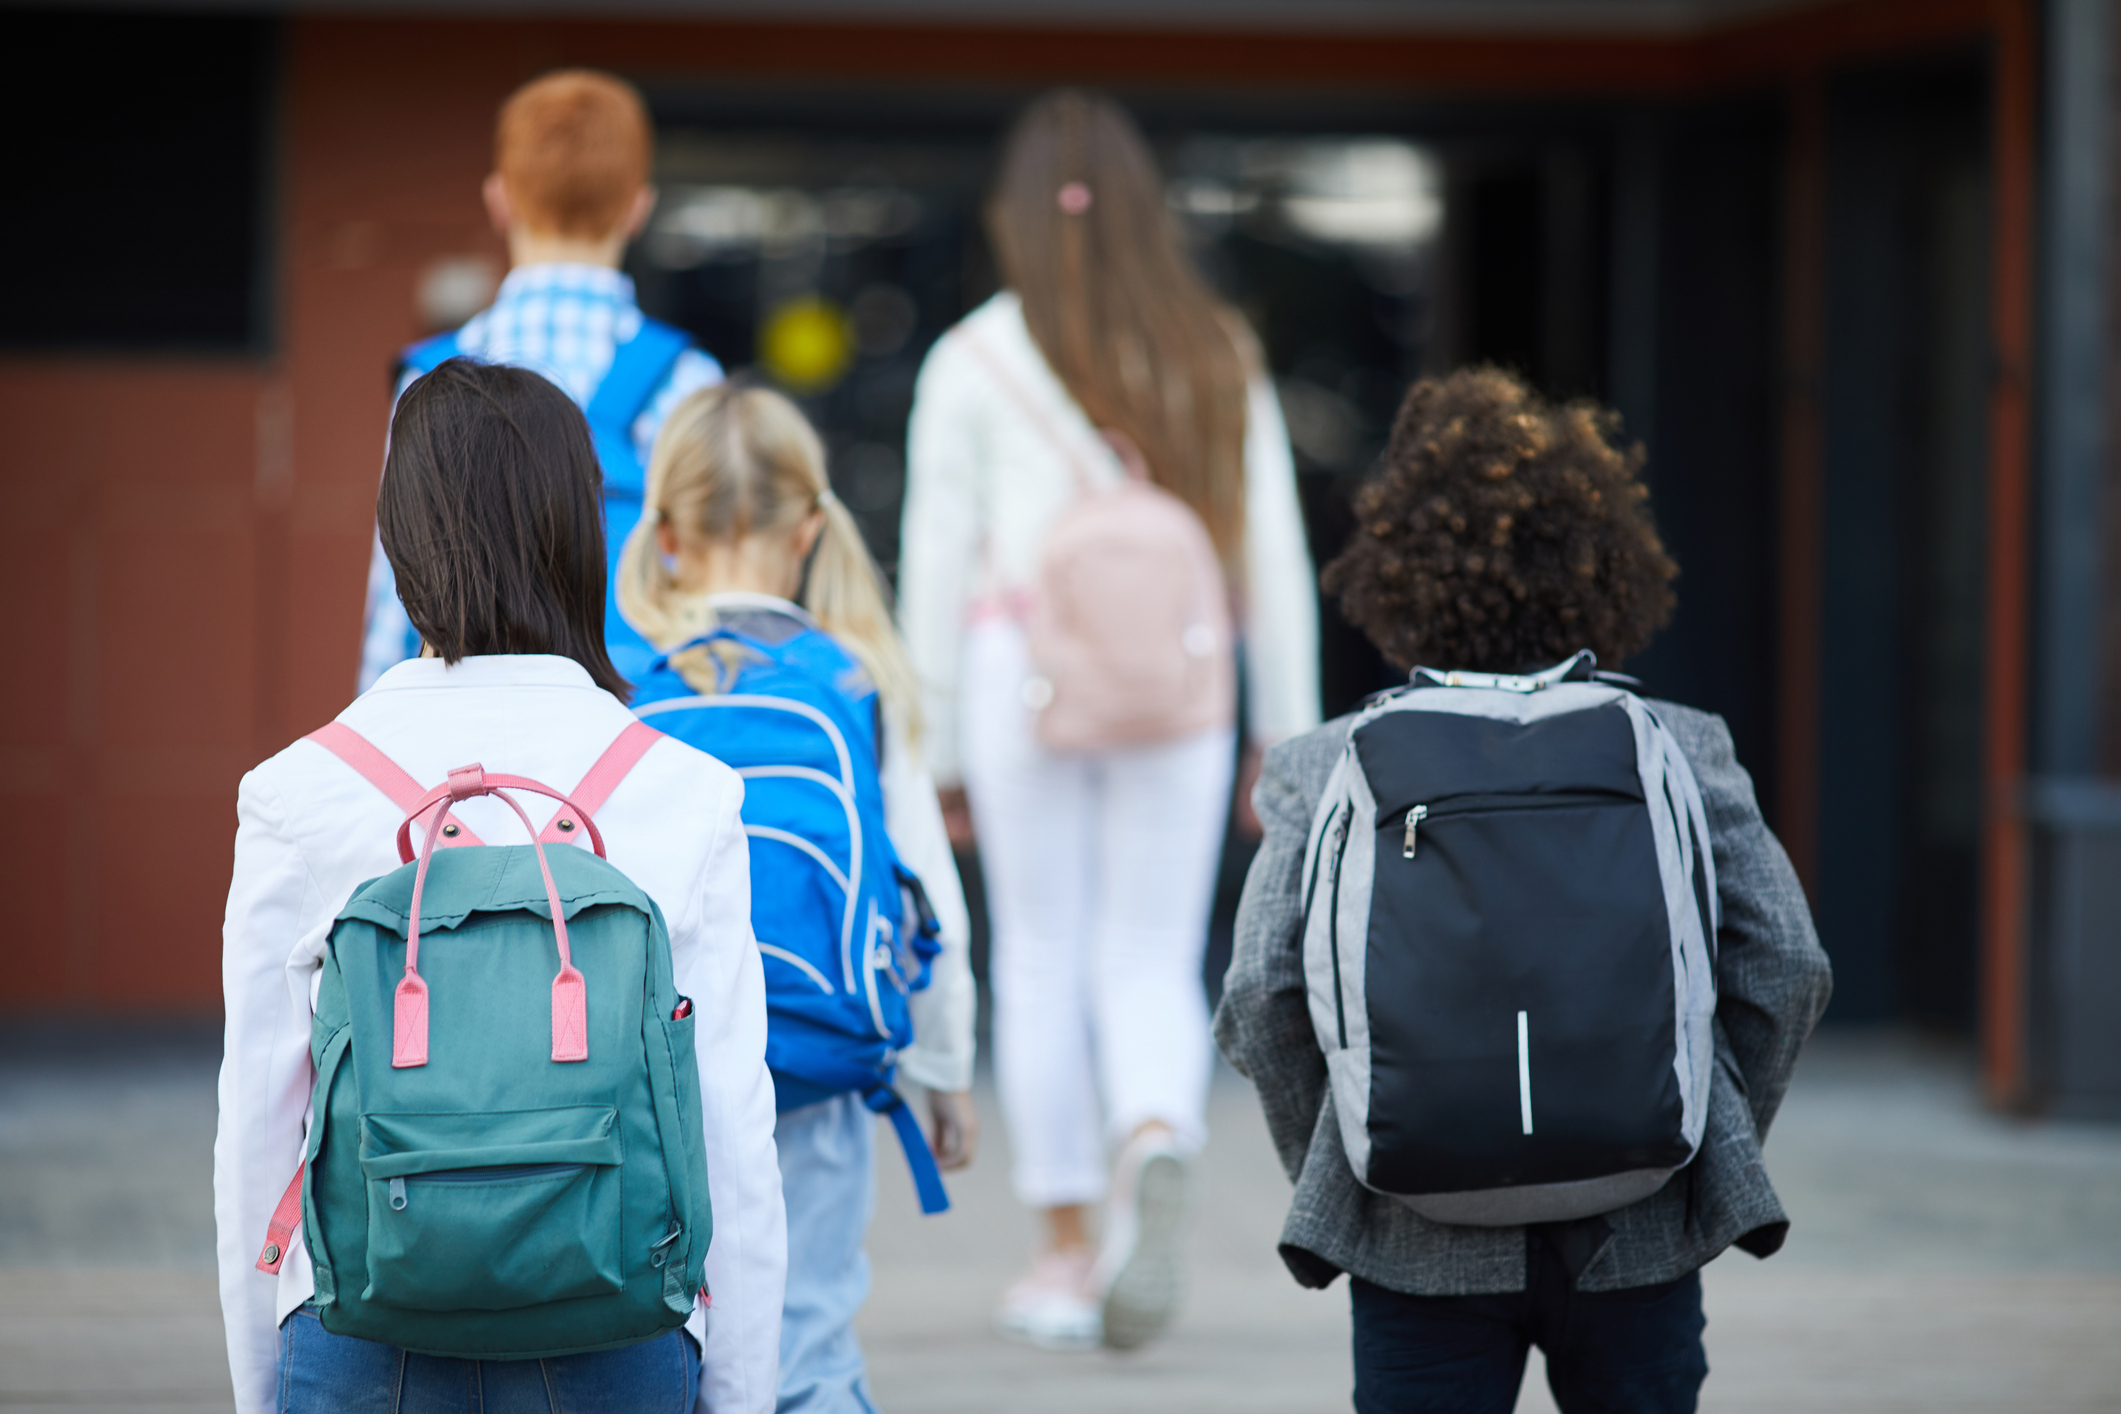 MEA Board of Directors on safe return to school